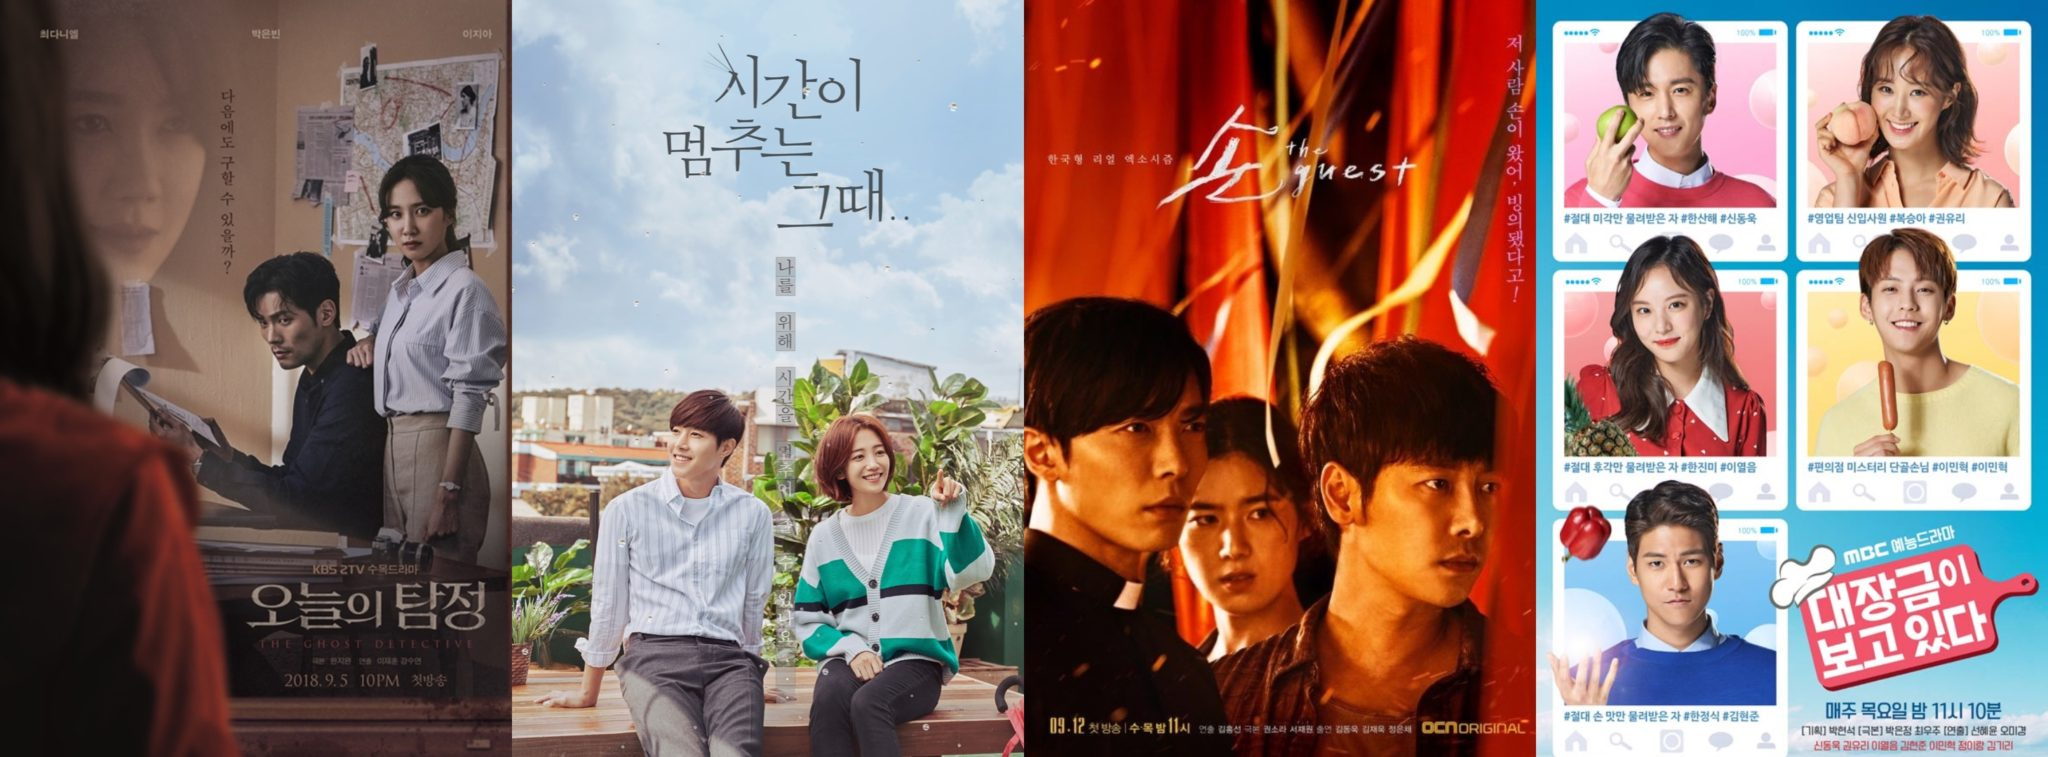 Where to Watch On Air Korean Dramas: October 22 - 28, 2018